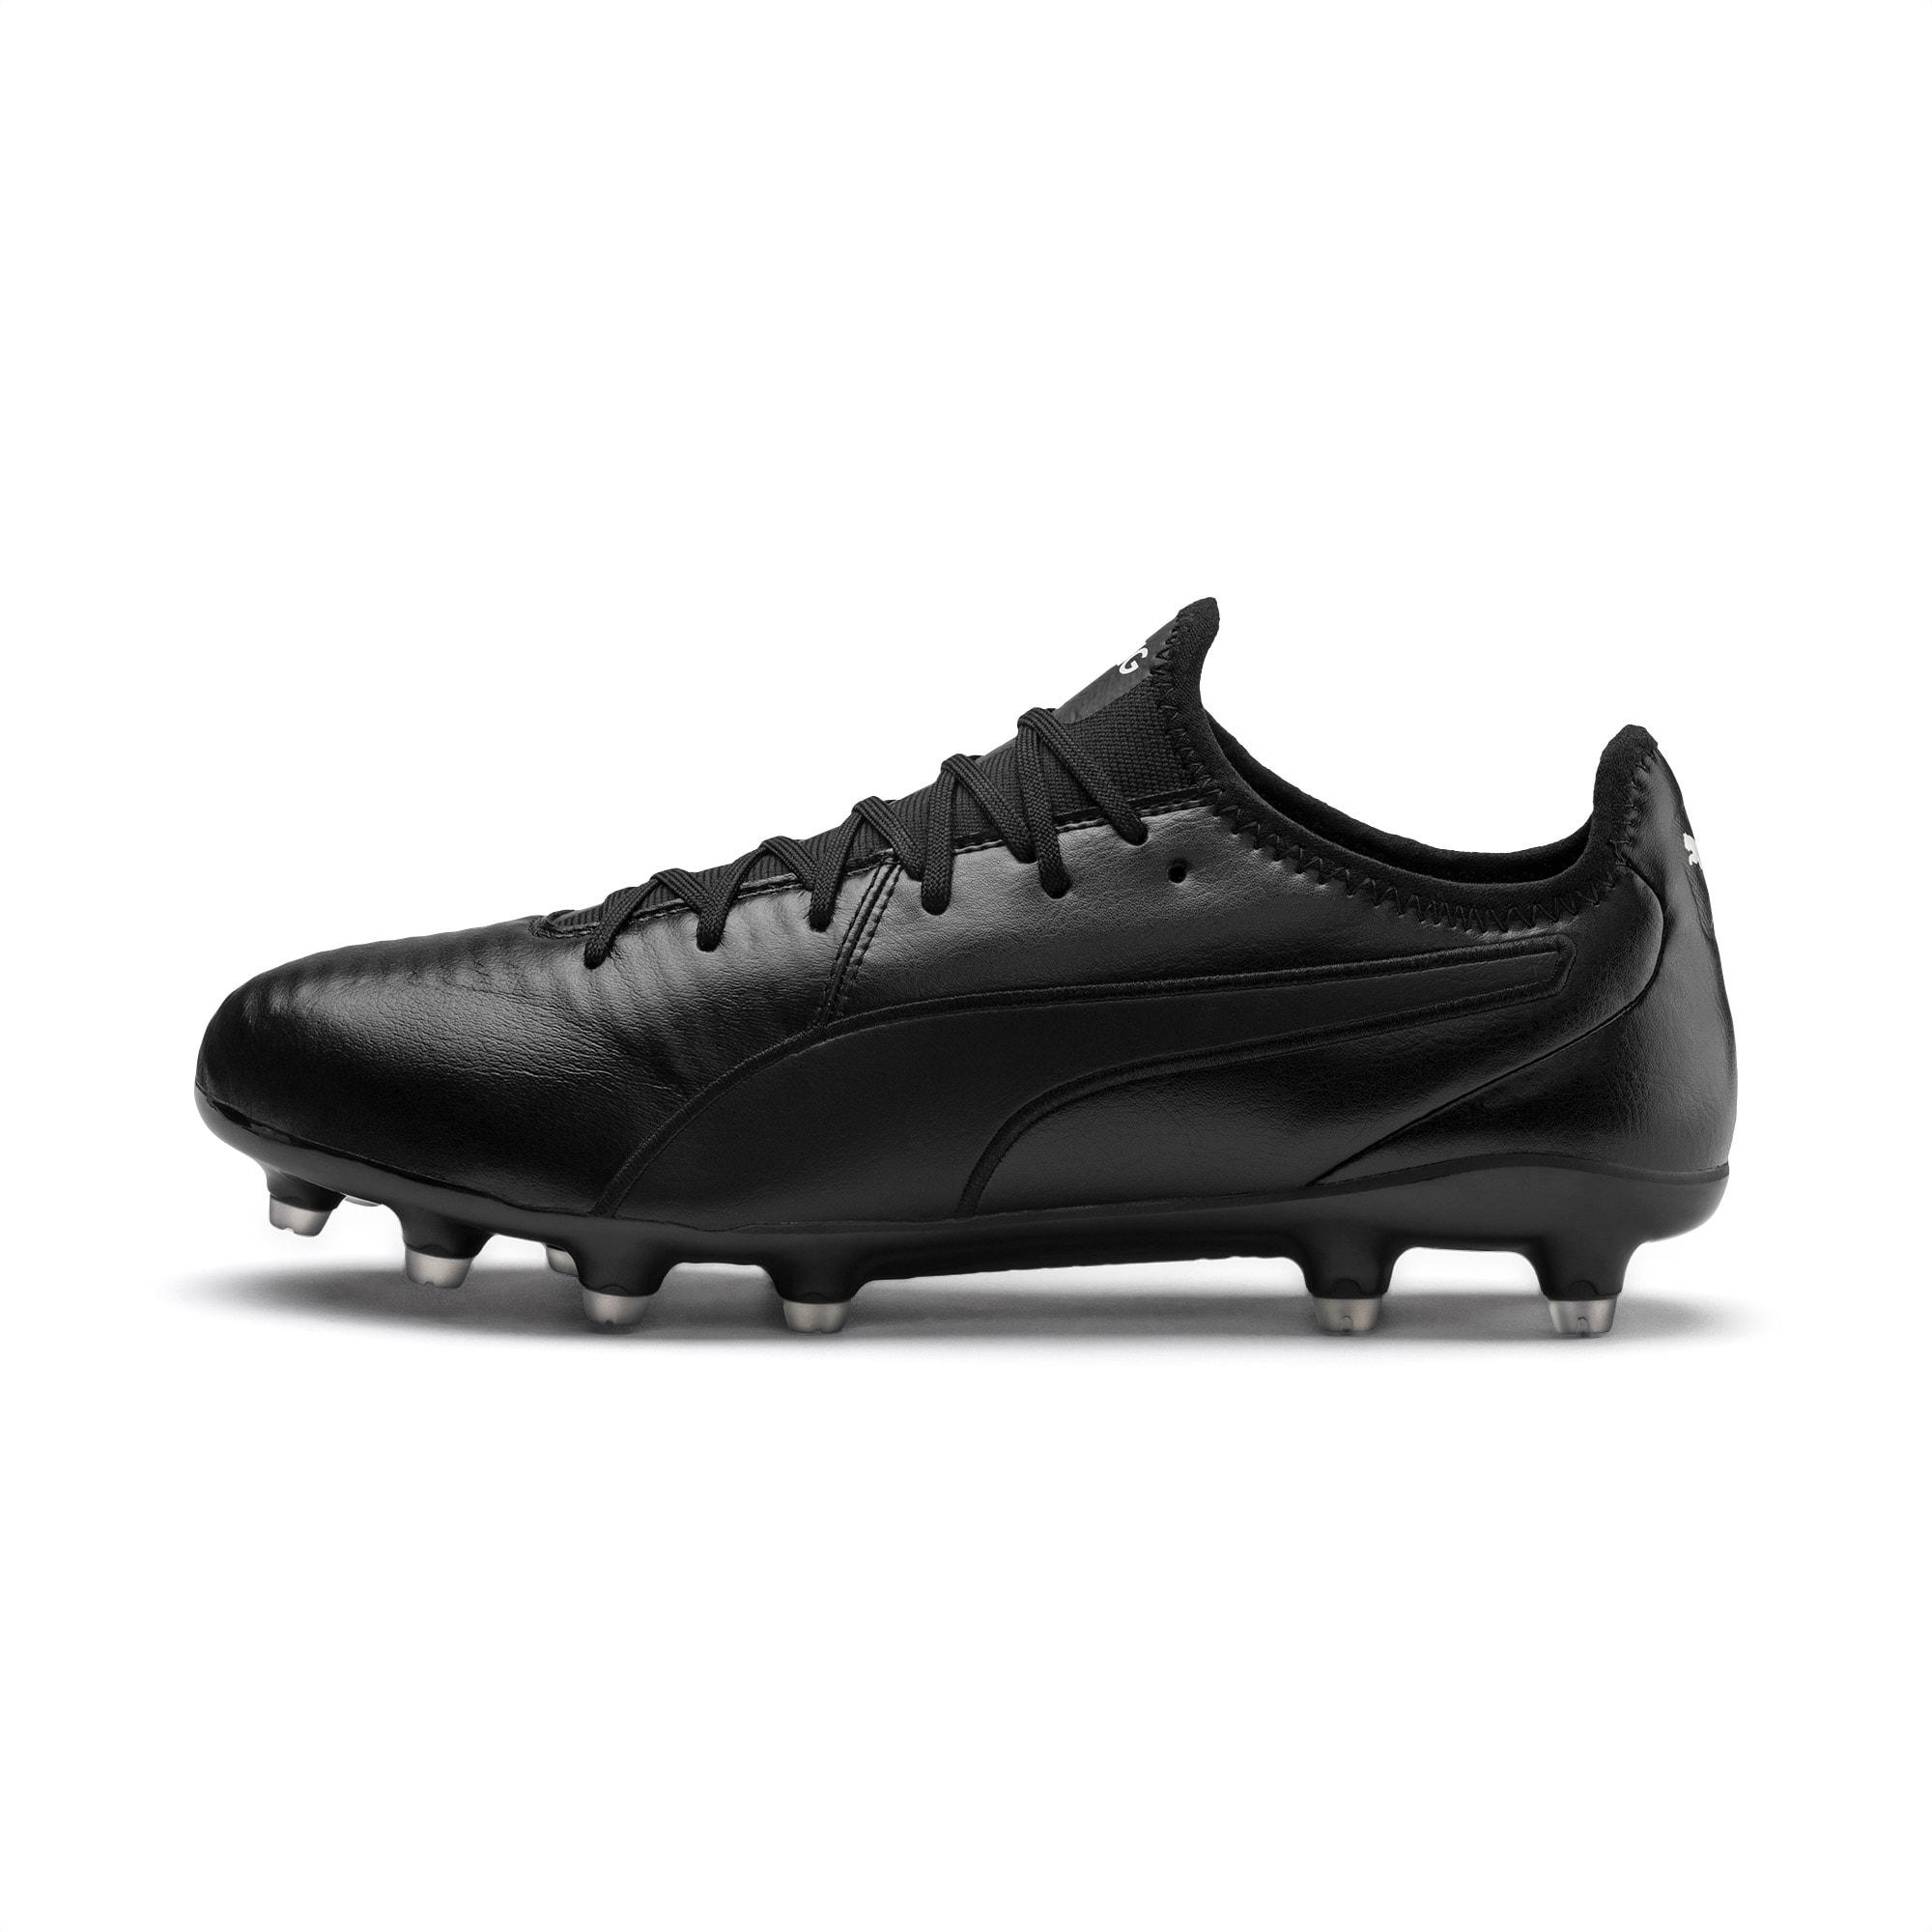 KING Pro FG Football Boots